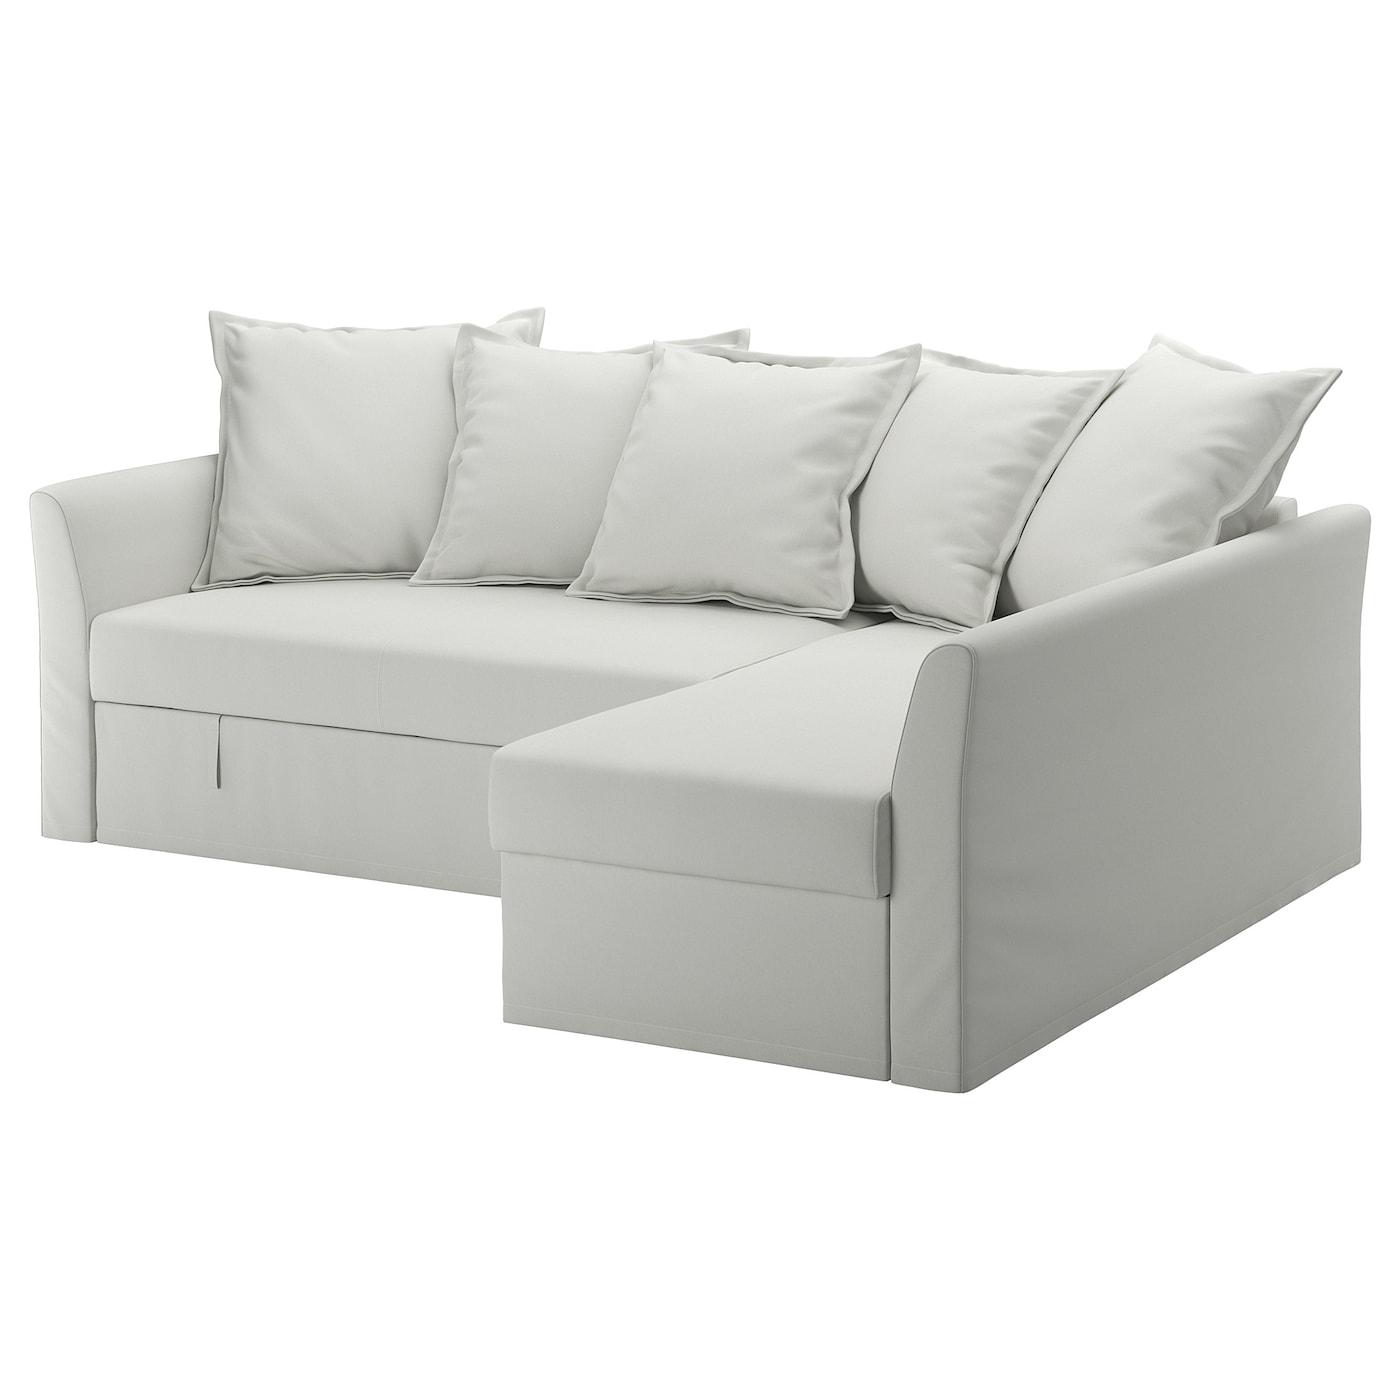 Holmsund divano letto angolare orrsta bianco grigio ikea for Divano holmsund